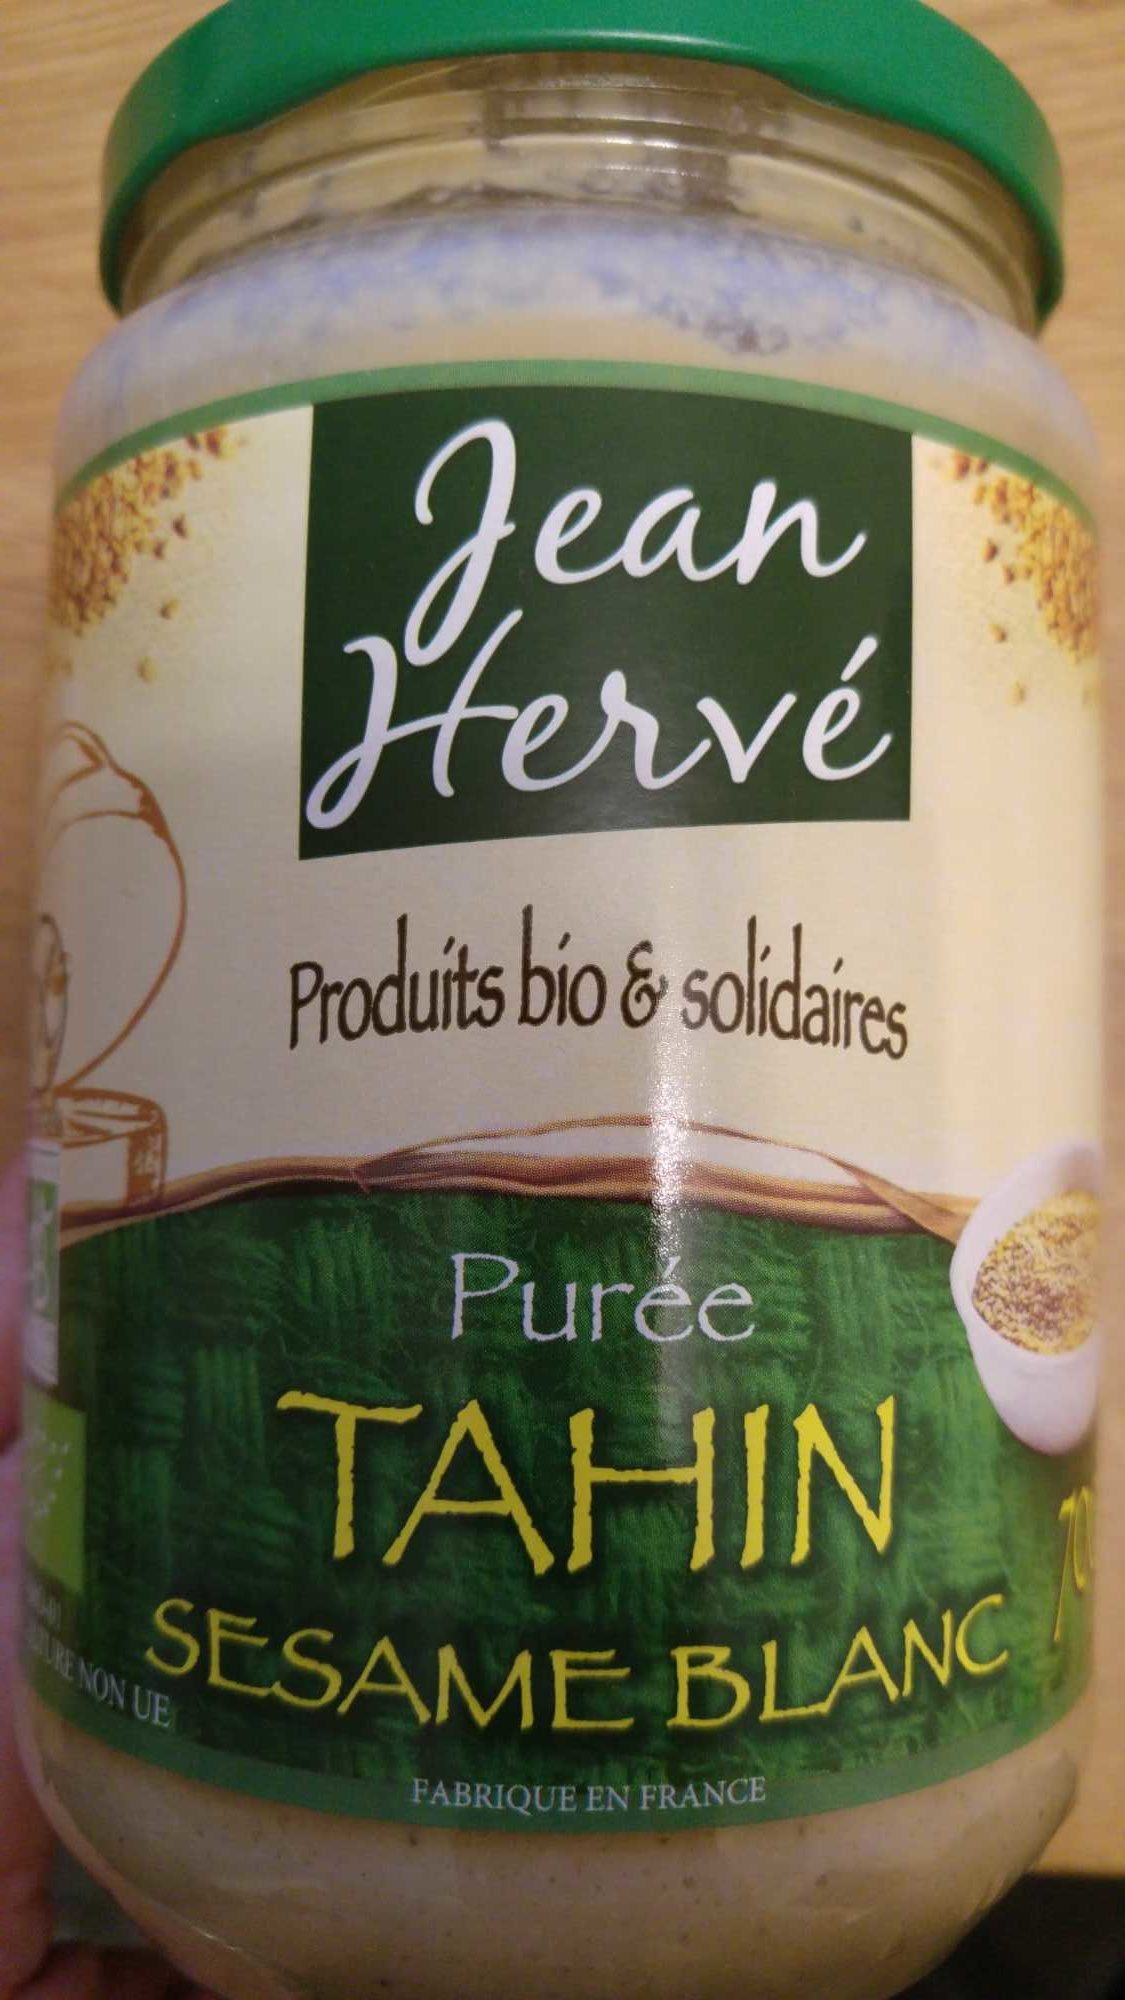 Purée Tahin Sésame blanc - Product - fr